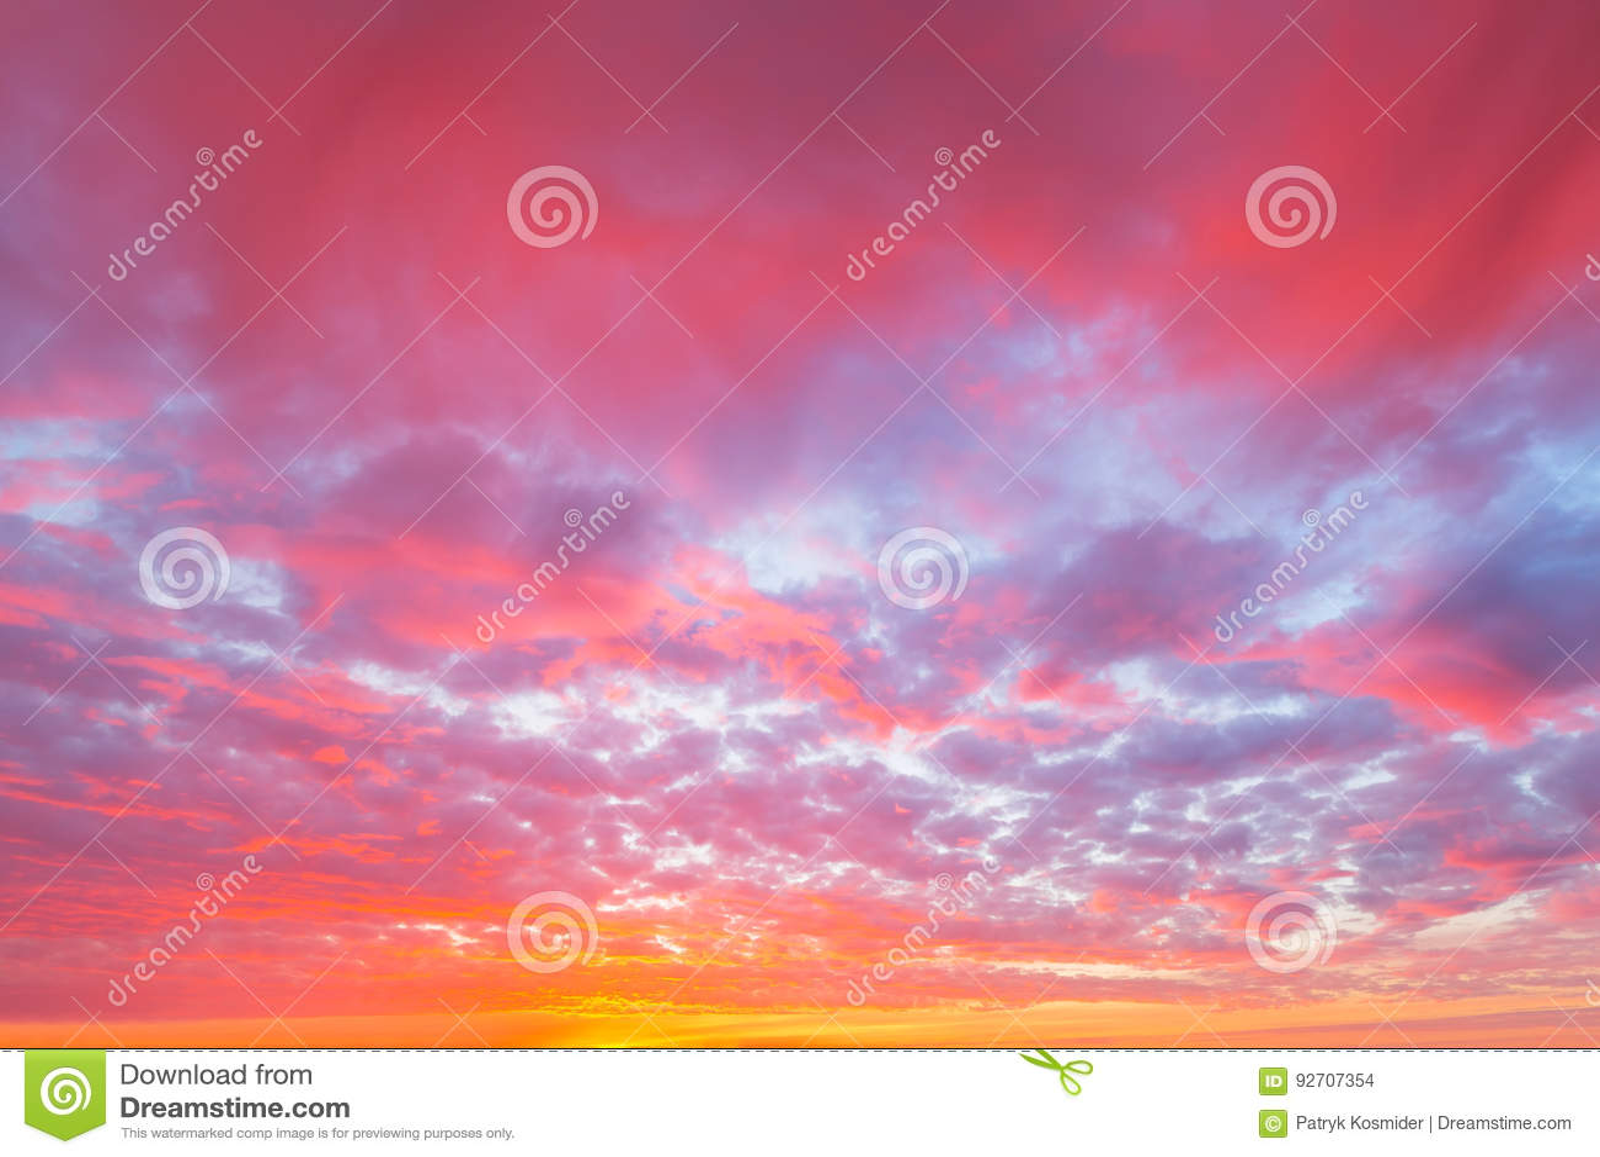 Dramatic sky pattern